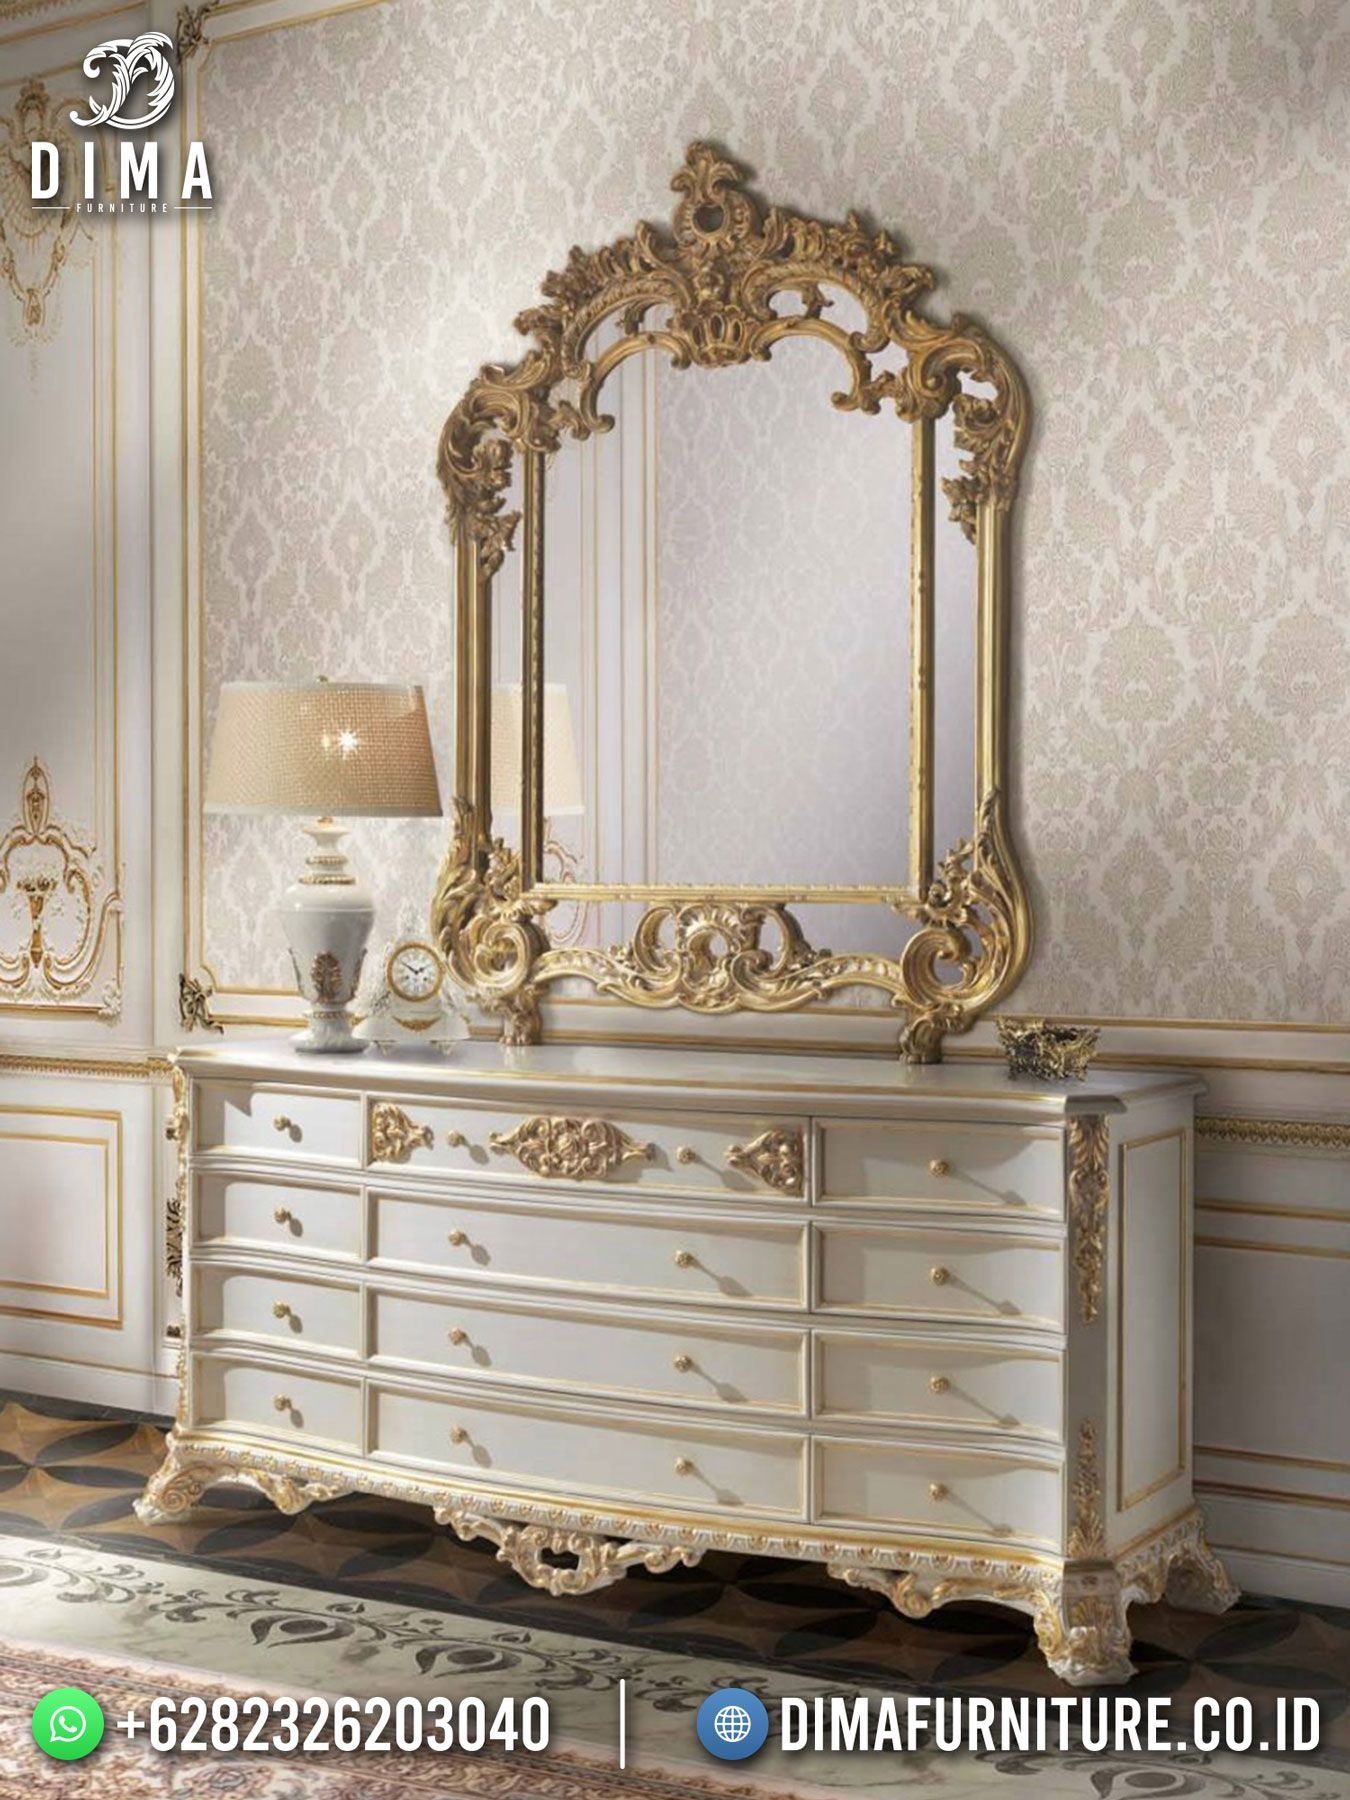 New Meja Konsul Jepara Elegant Design Italian Carving Luxury TTJ-1717